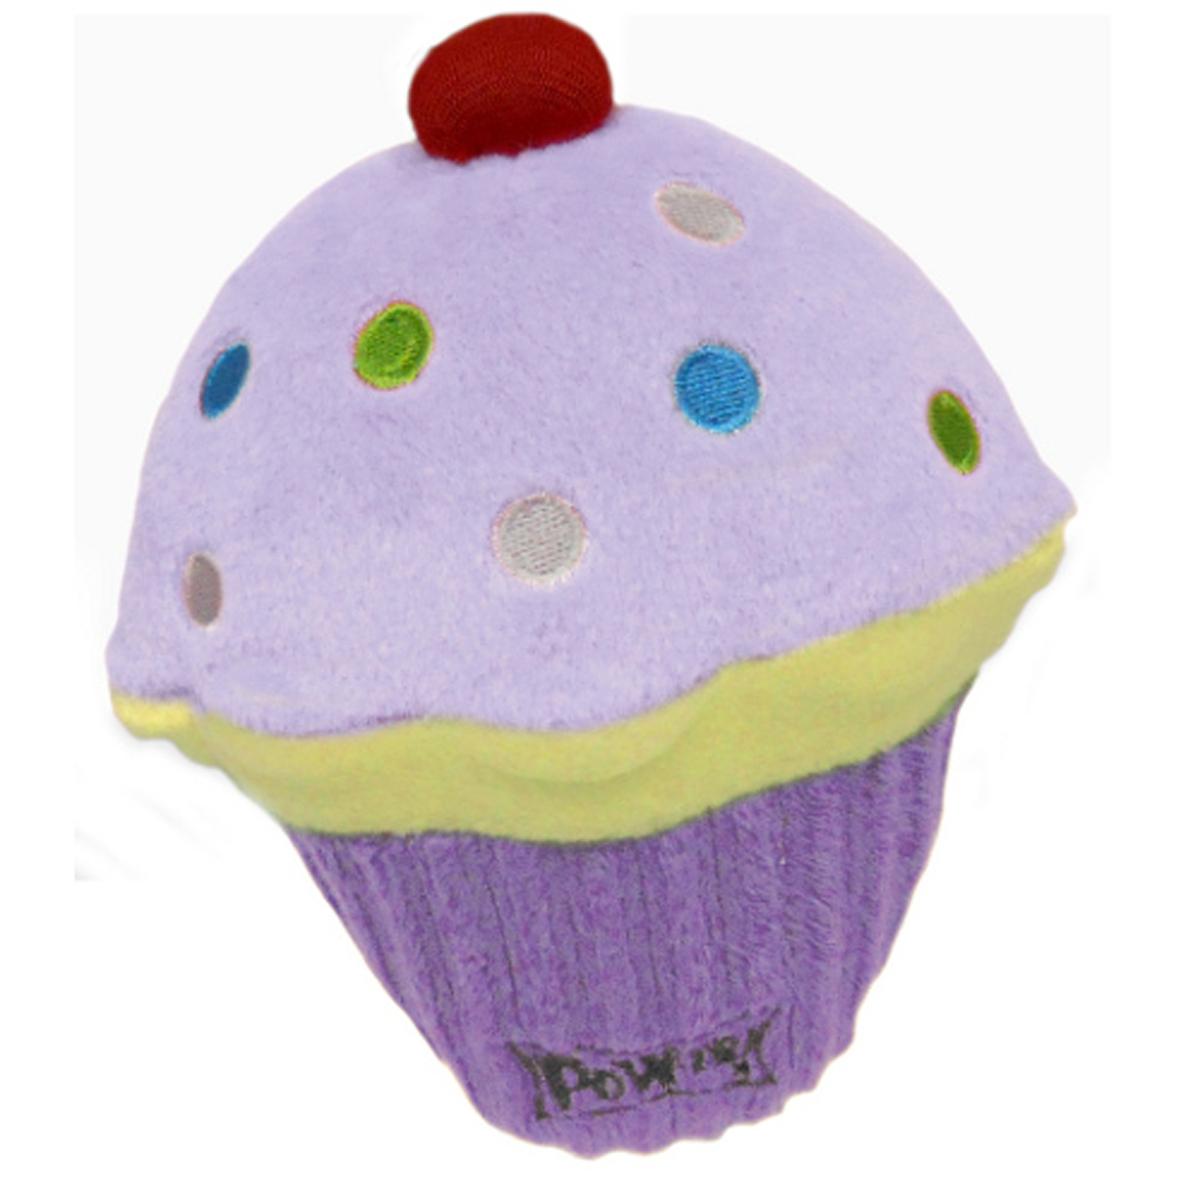 Lulubelles Power Plush Dog Toy - Purple Pupcake